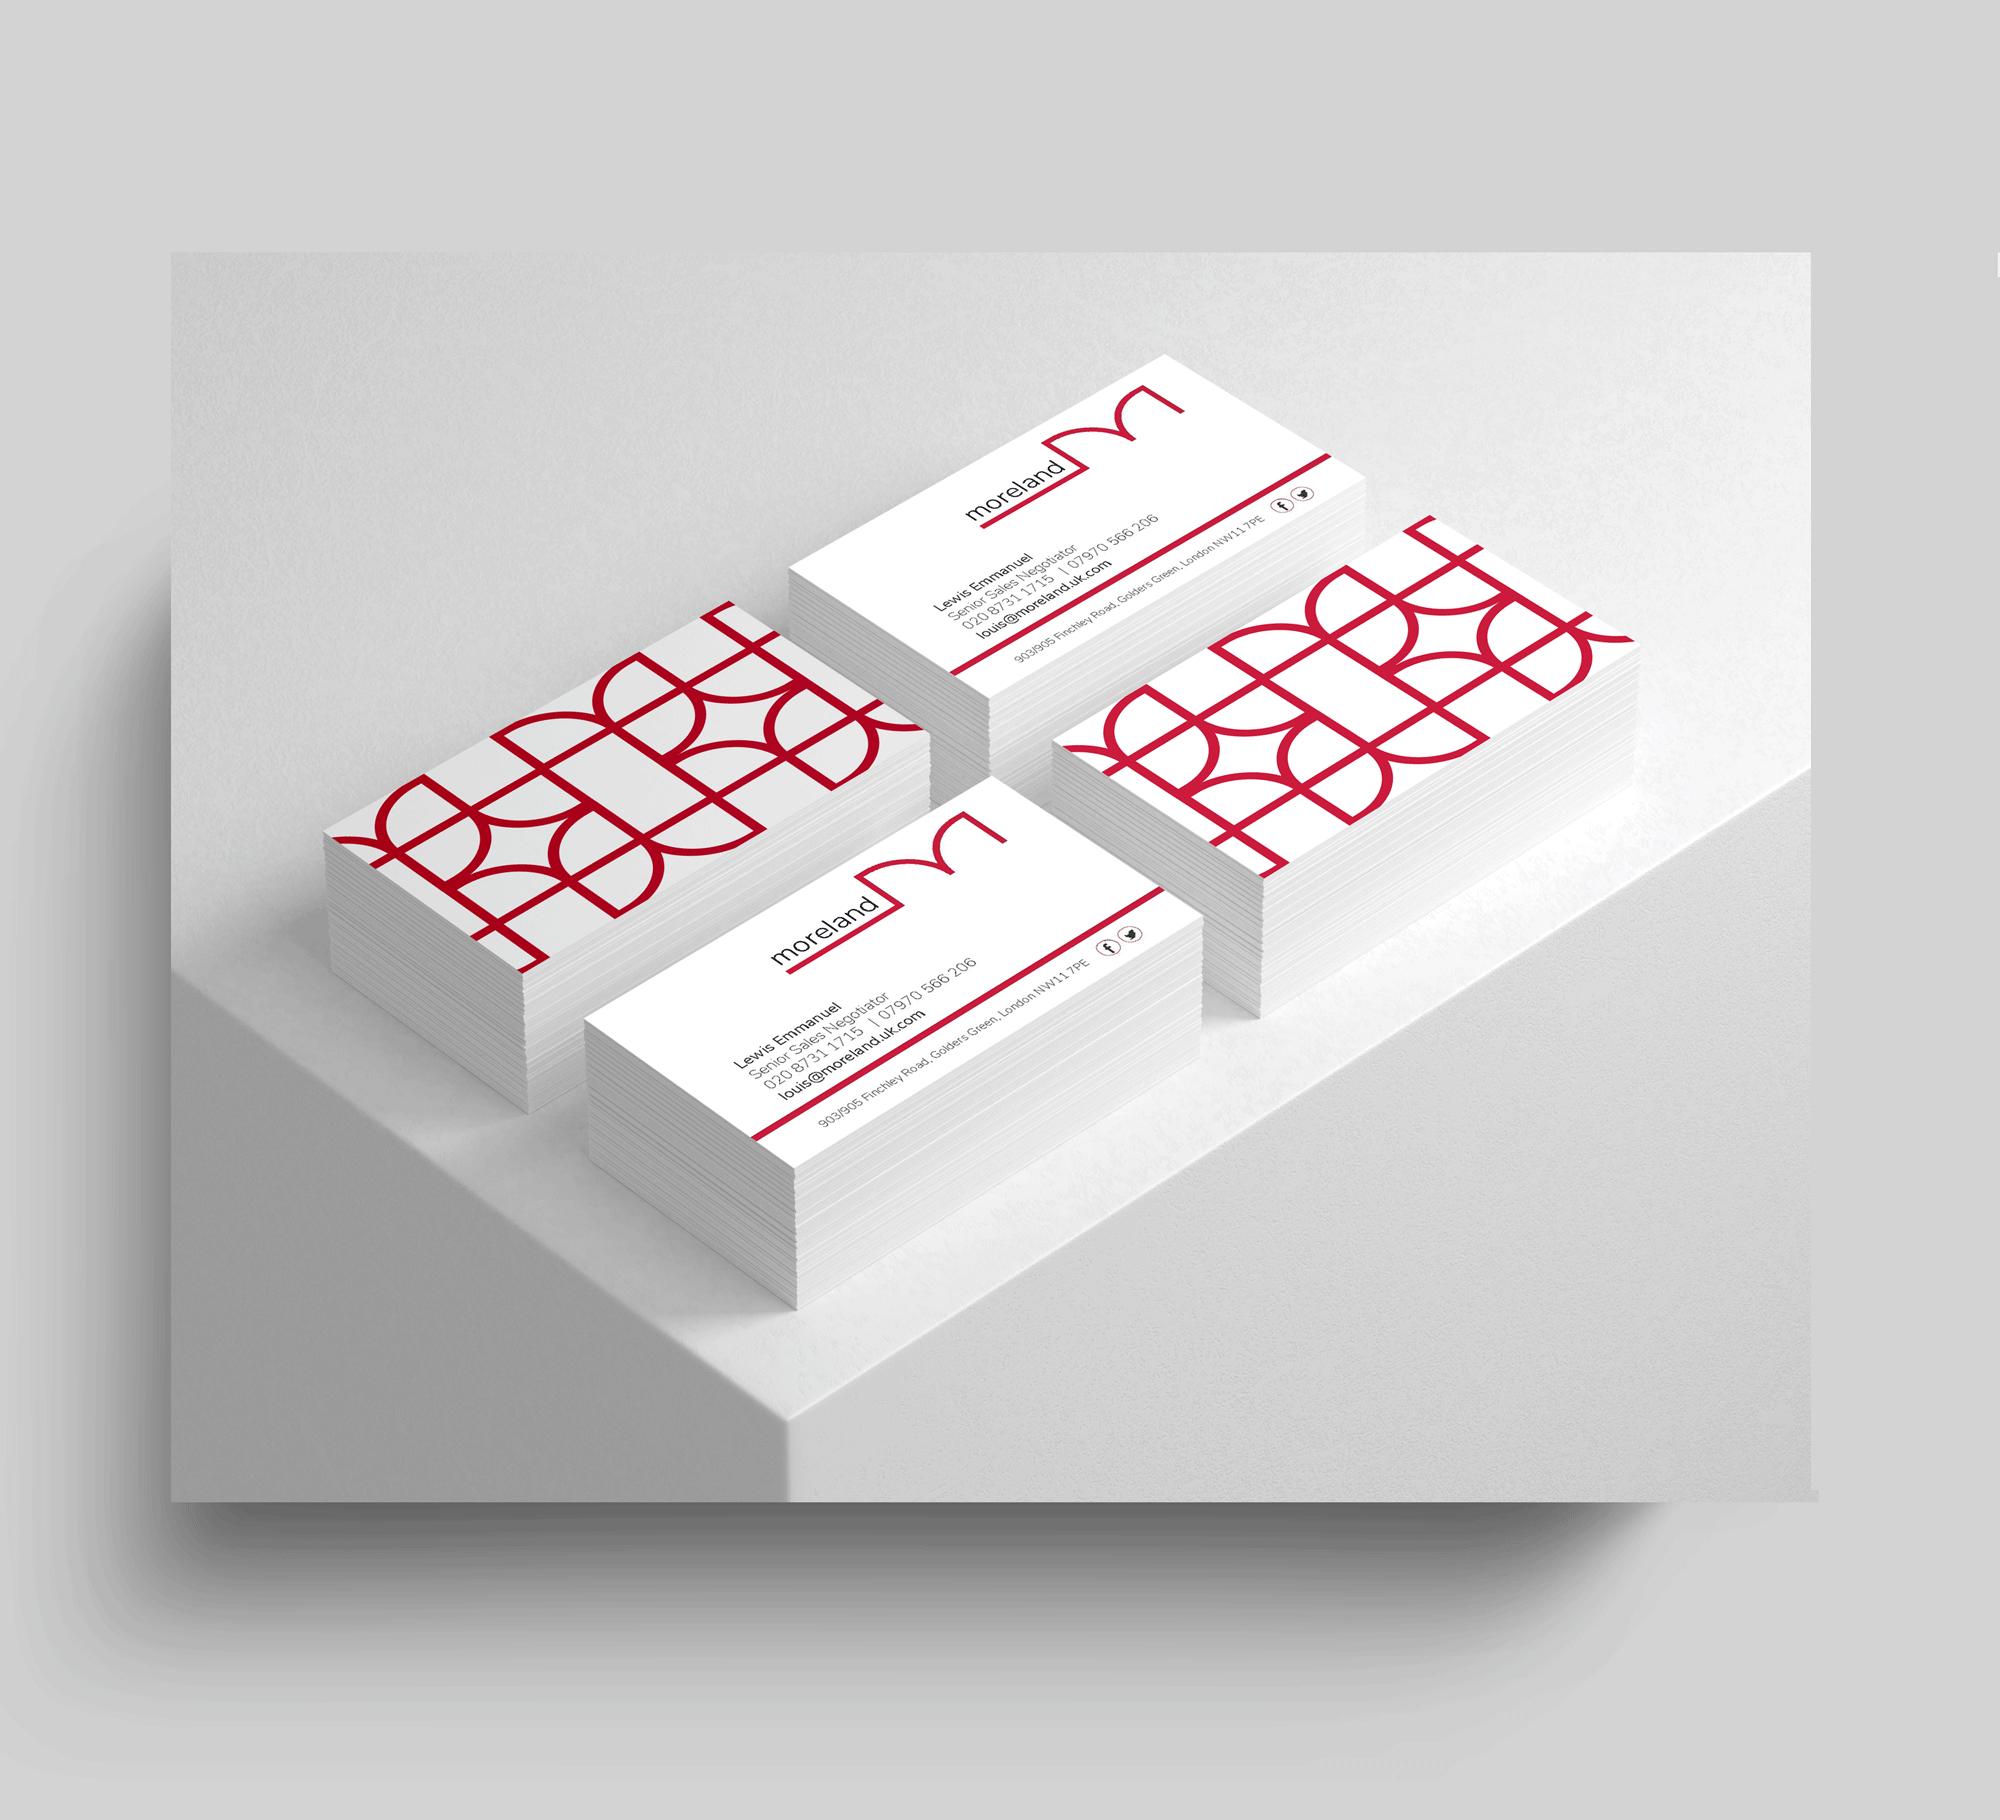 moreland_business-cards_grey